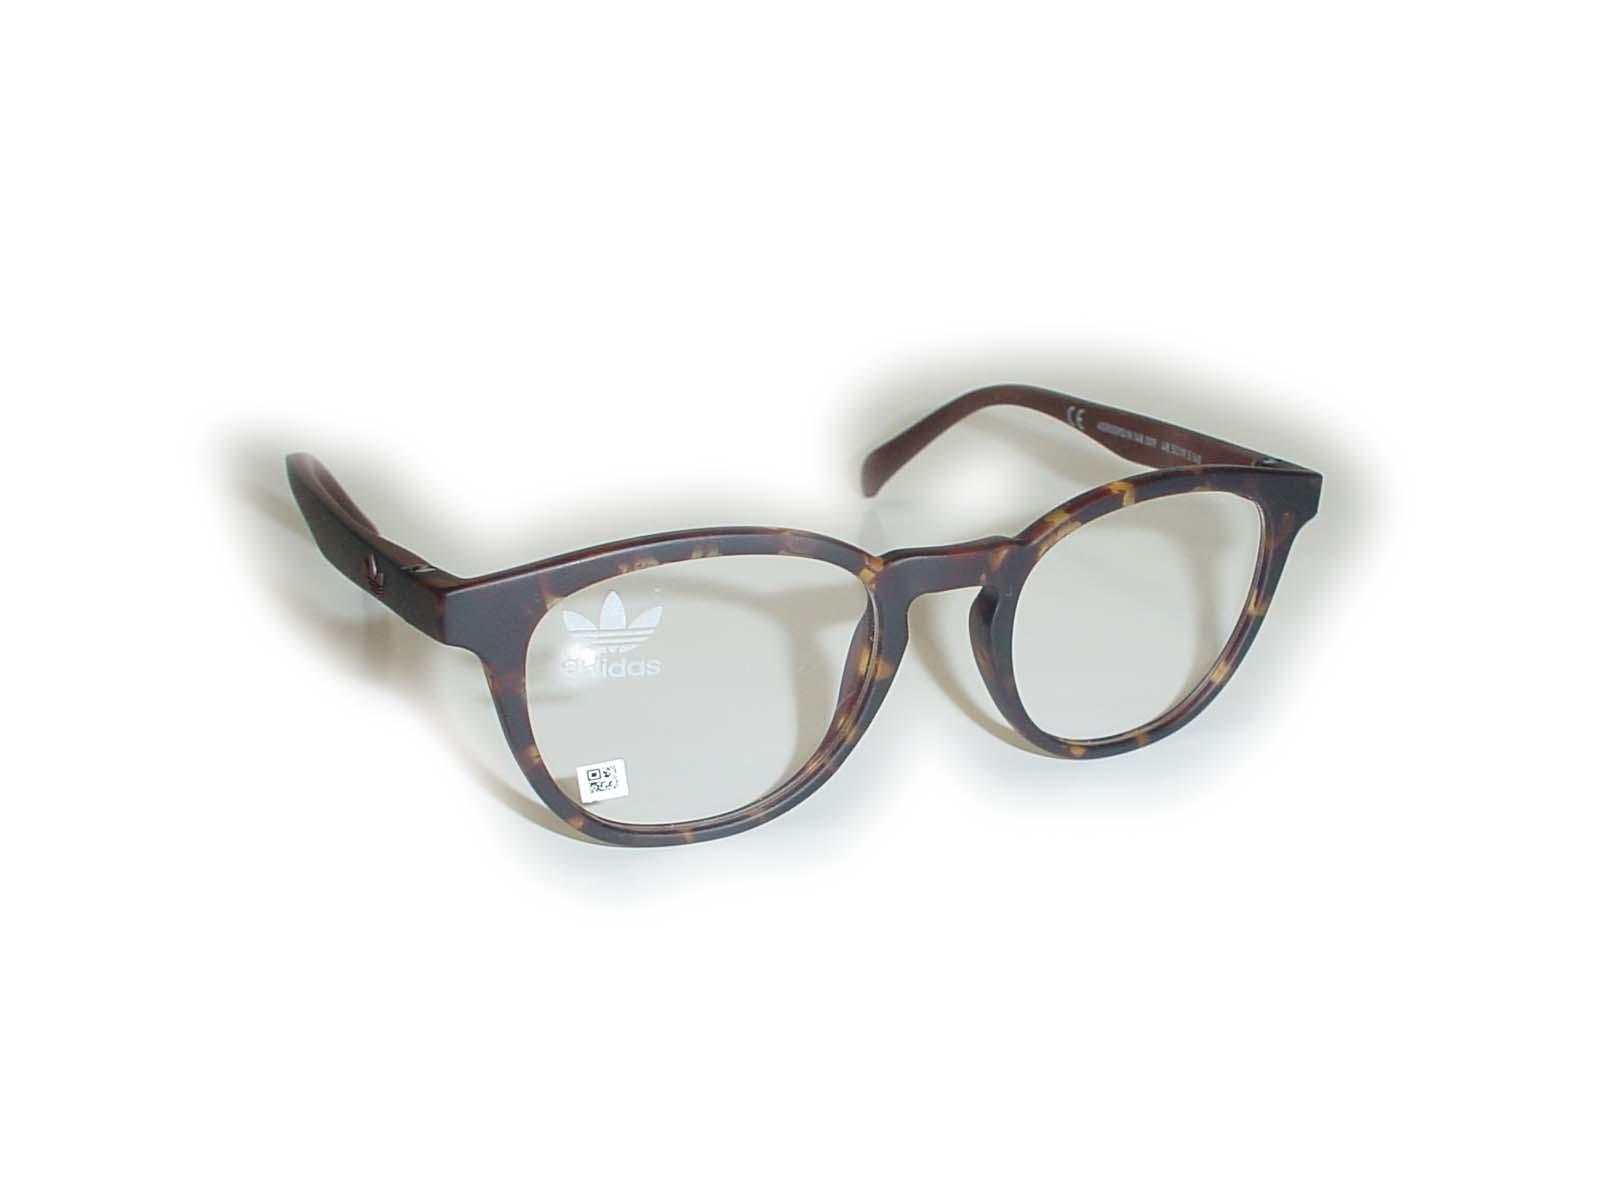 ★adidas(アディス)★AOR0090/N48.5□19.5-140COL.148.009デミブラウン超薄型非球面レンズ付